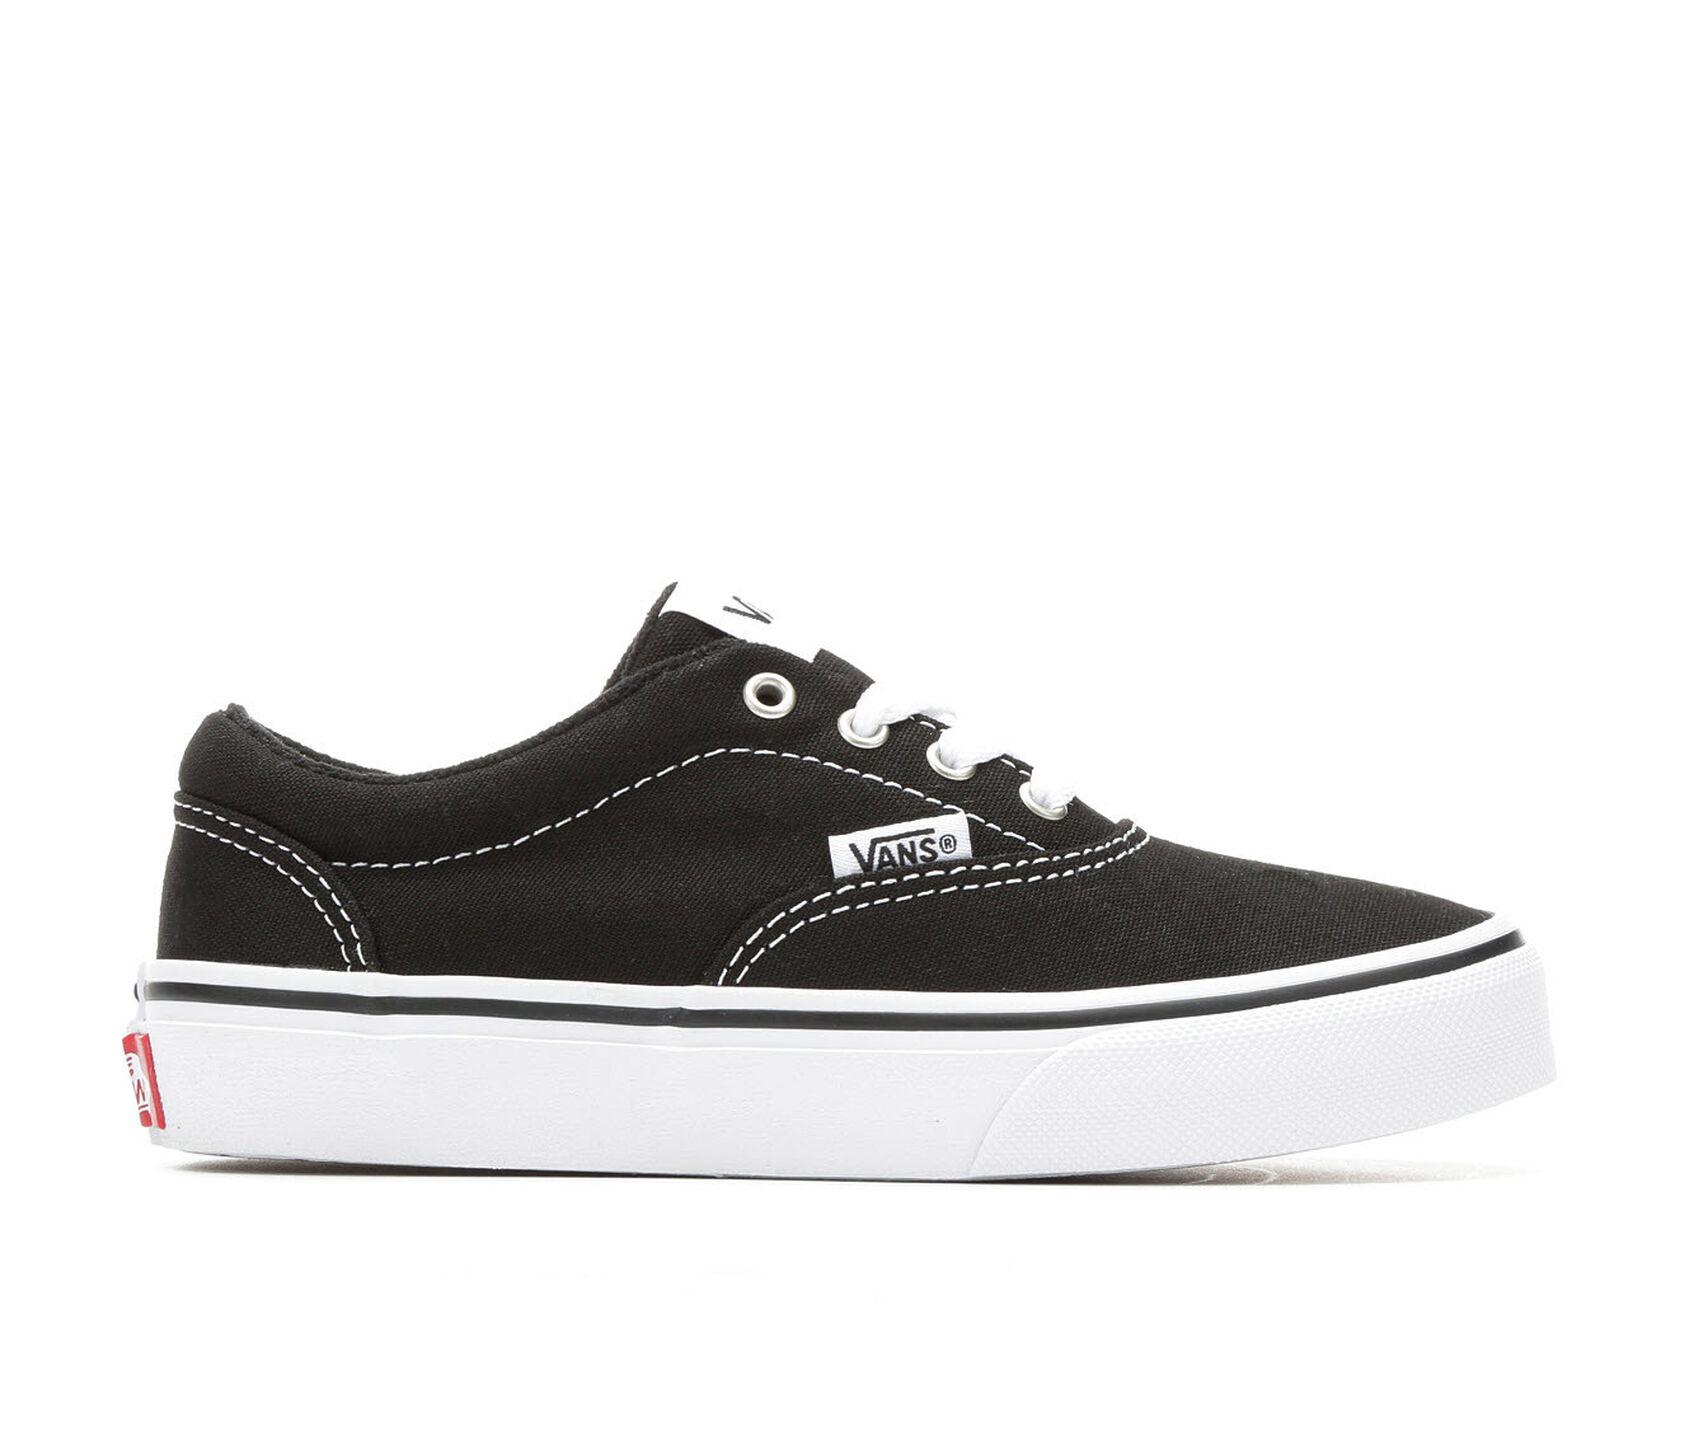 65ba50de9370ed Kids  Vans Little Kid   Big Kid Doheny Skate Shoes